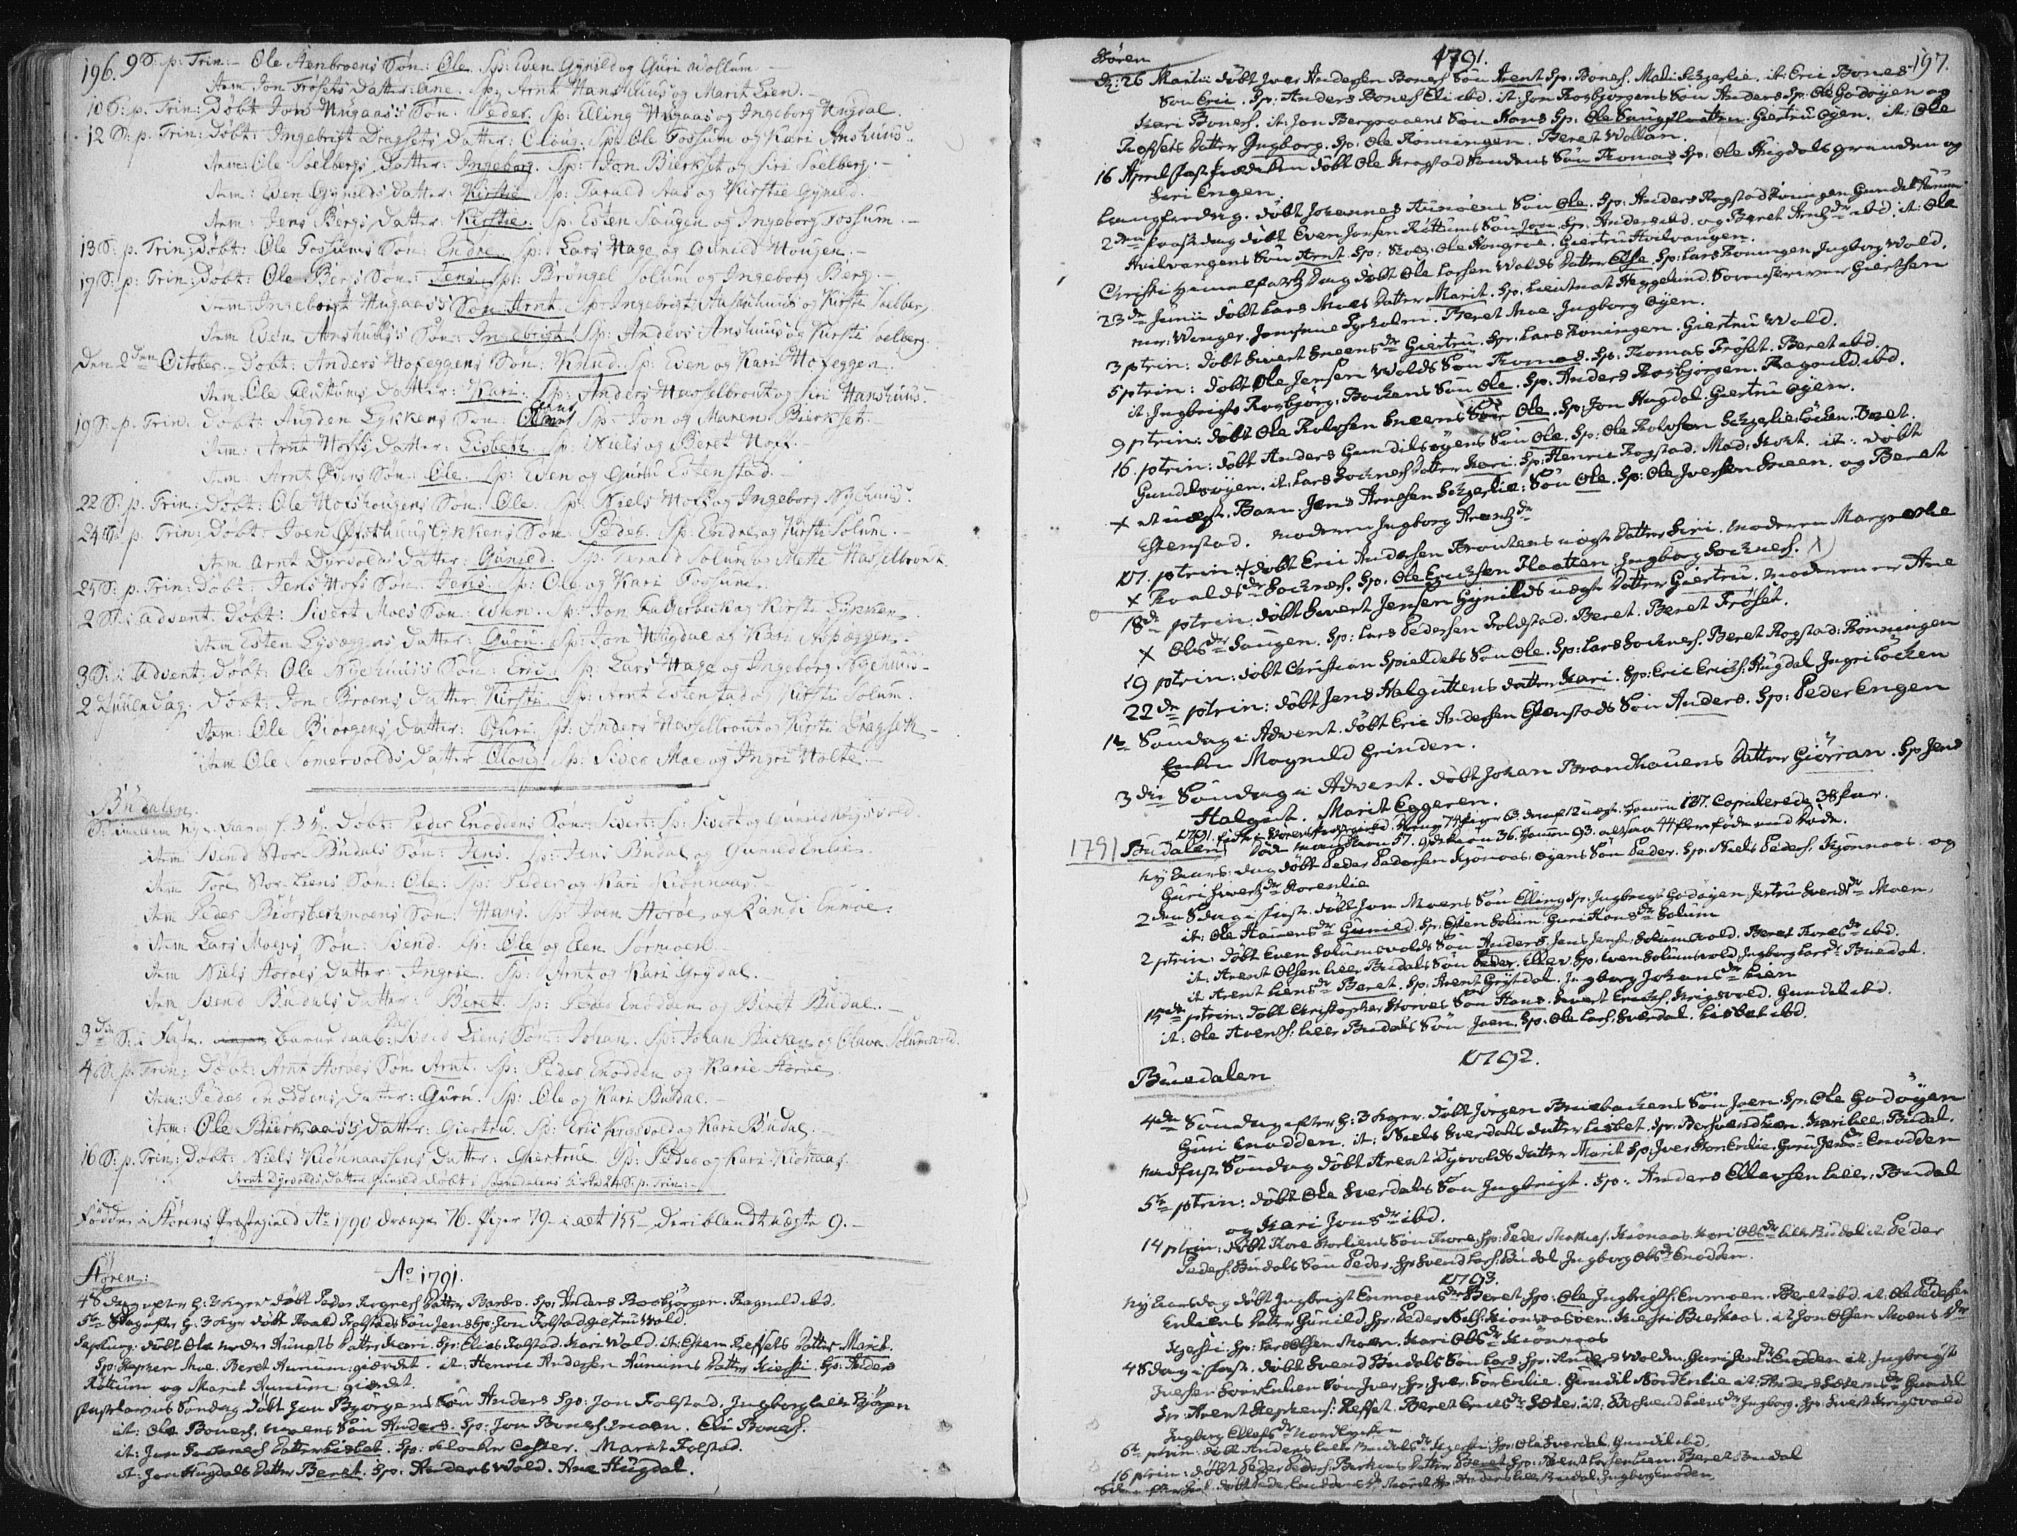 SAT, Ministerialprotokoller, klokkerbøker og fødselsregistre - Sør-Trøndelag, 687/L0992: Parish register (official) no. 687A03 /1, 1788-1815, p. 196-197